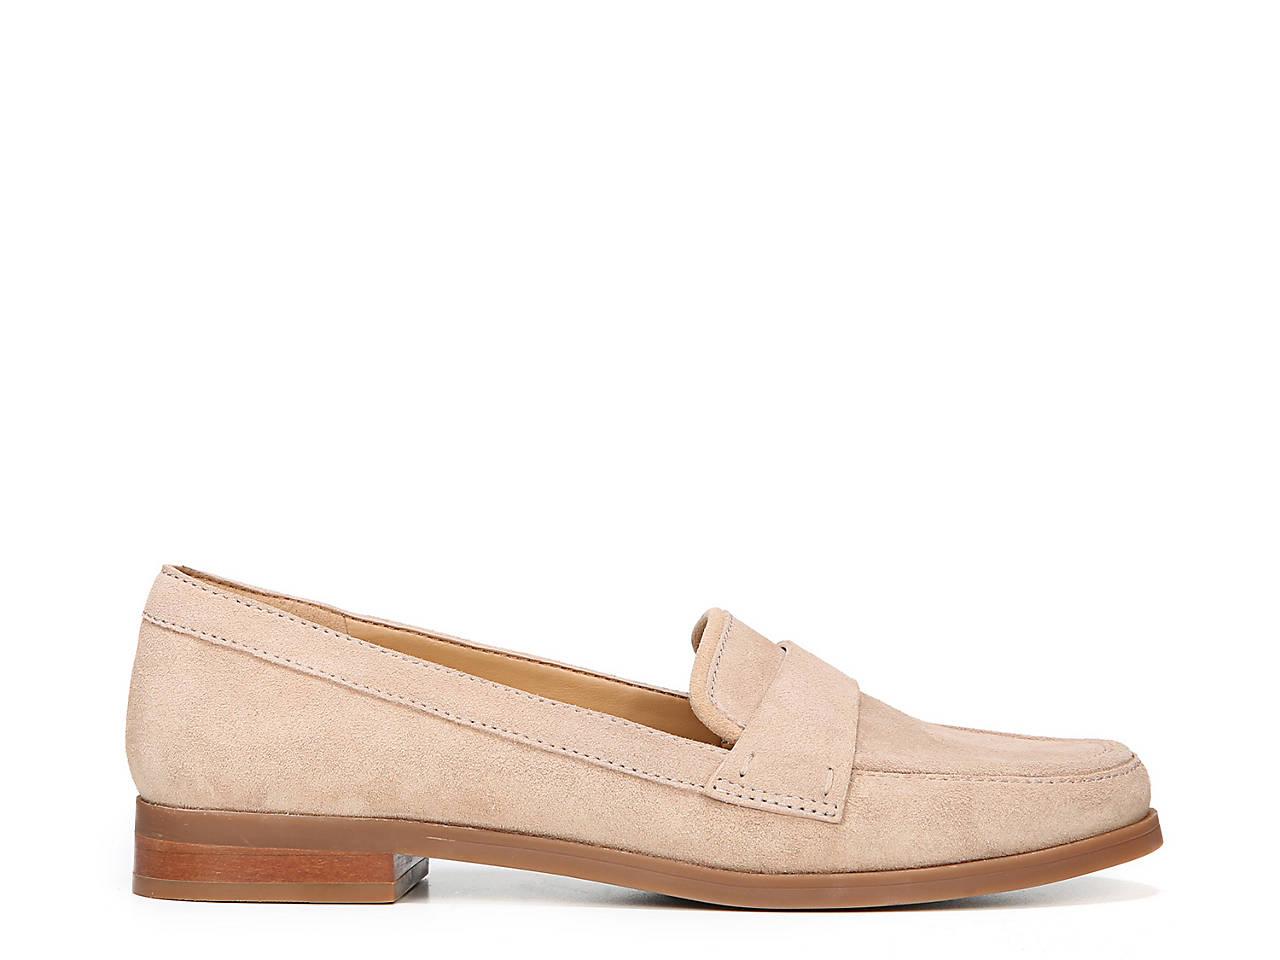 ac98b96dff3 Franco Sarto Valera Loafer Women s Shoes